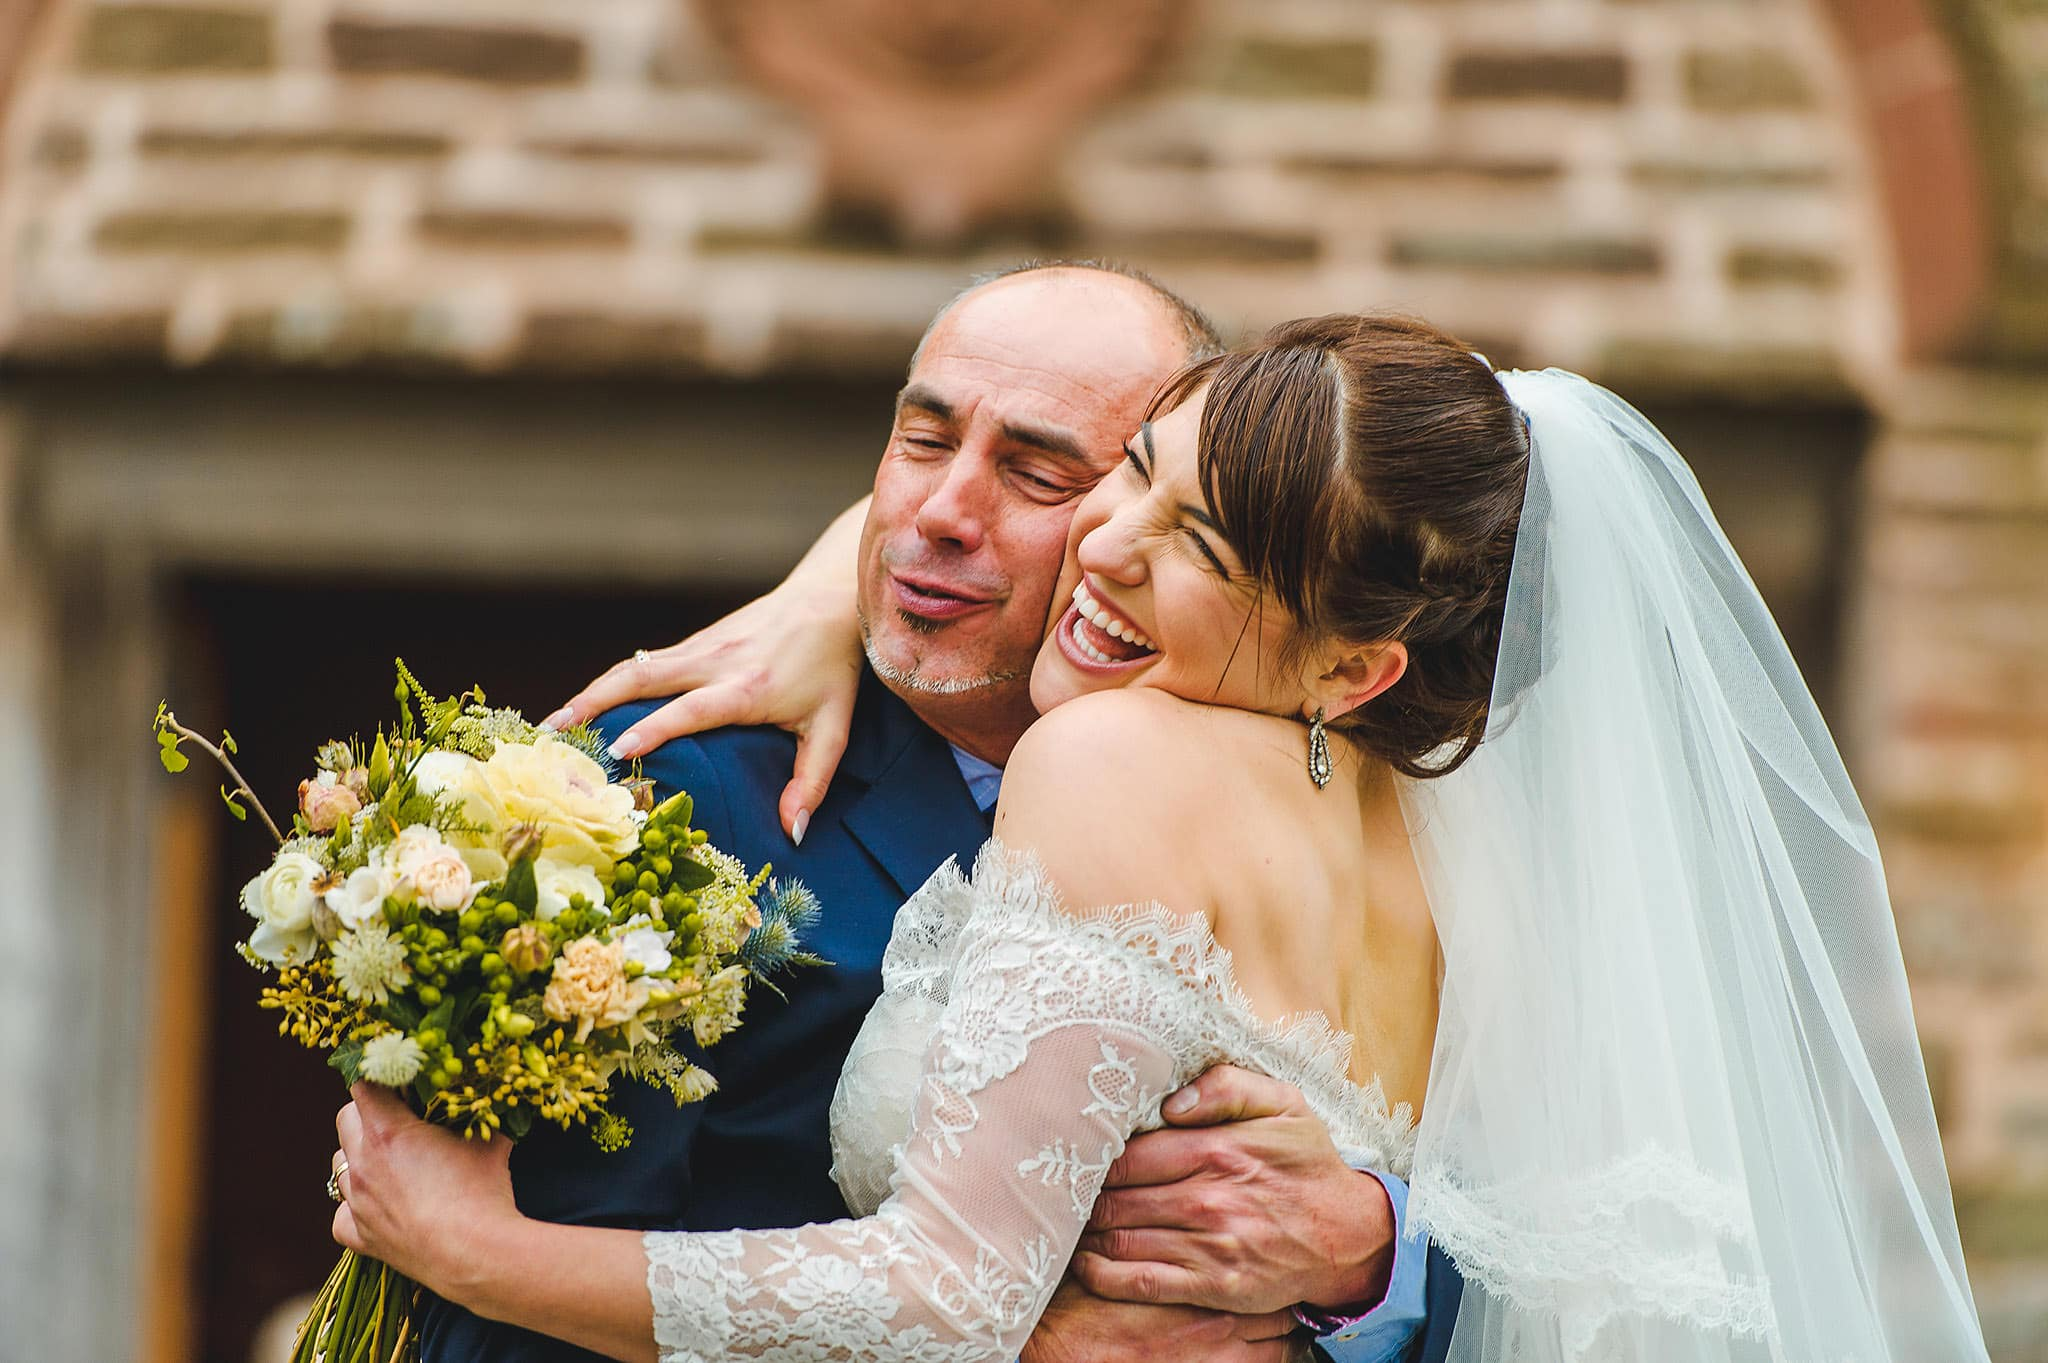 Dewsall Court wedding photography Herefordshire | Laura + Alex 58